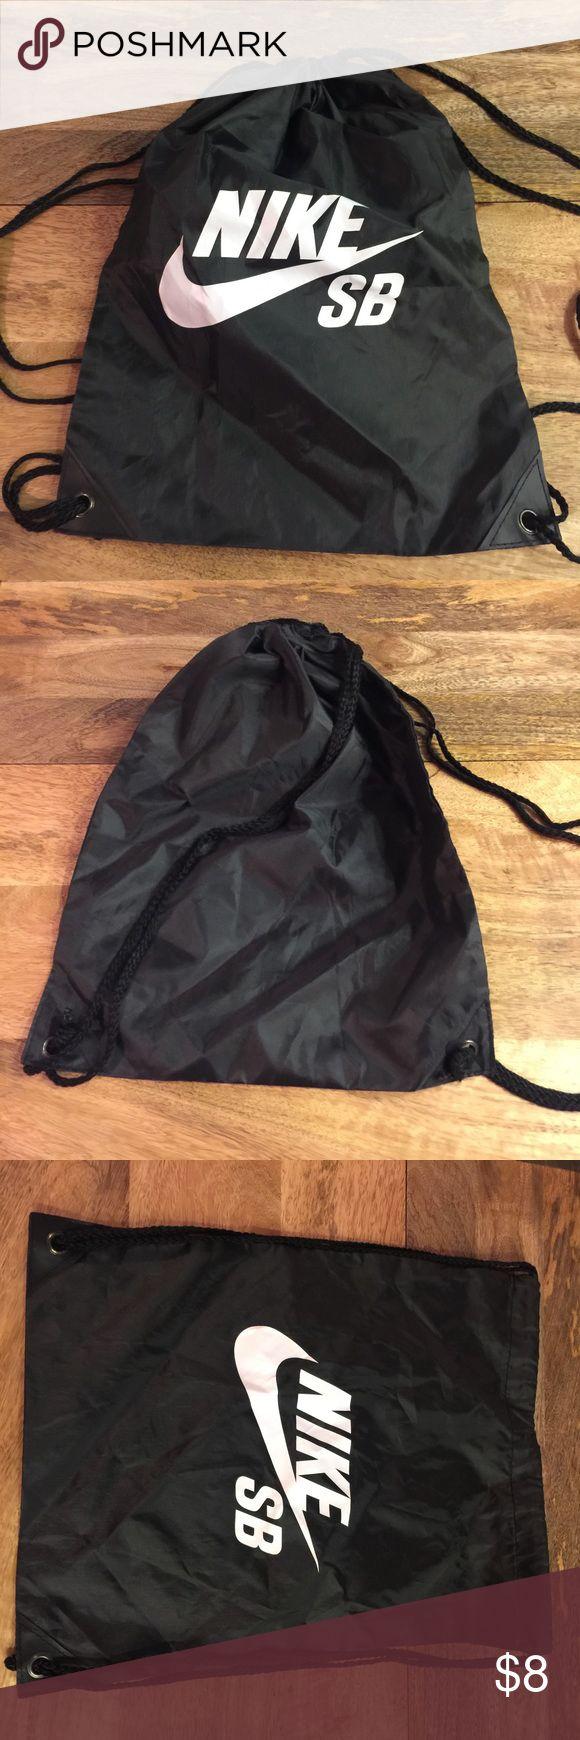 : Nike SB sack! #ark #fashion #shopping #style #Nike #Handbags